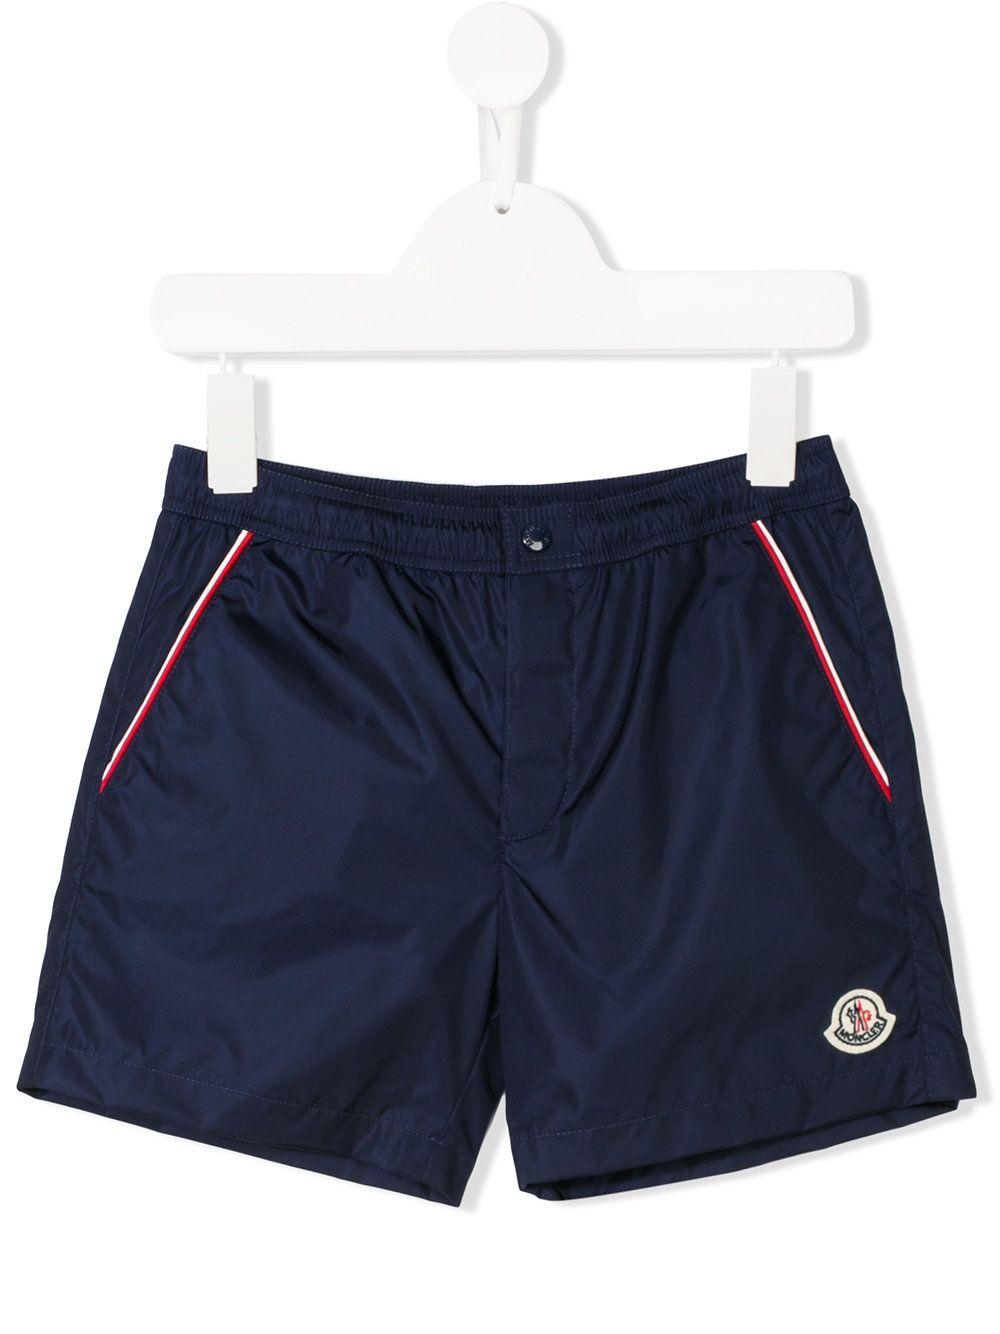 0146e6da8  moncler  swimwear  navy  swim  shorts  kids  summer  style www.jofre.eu